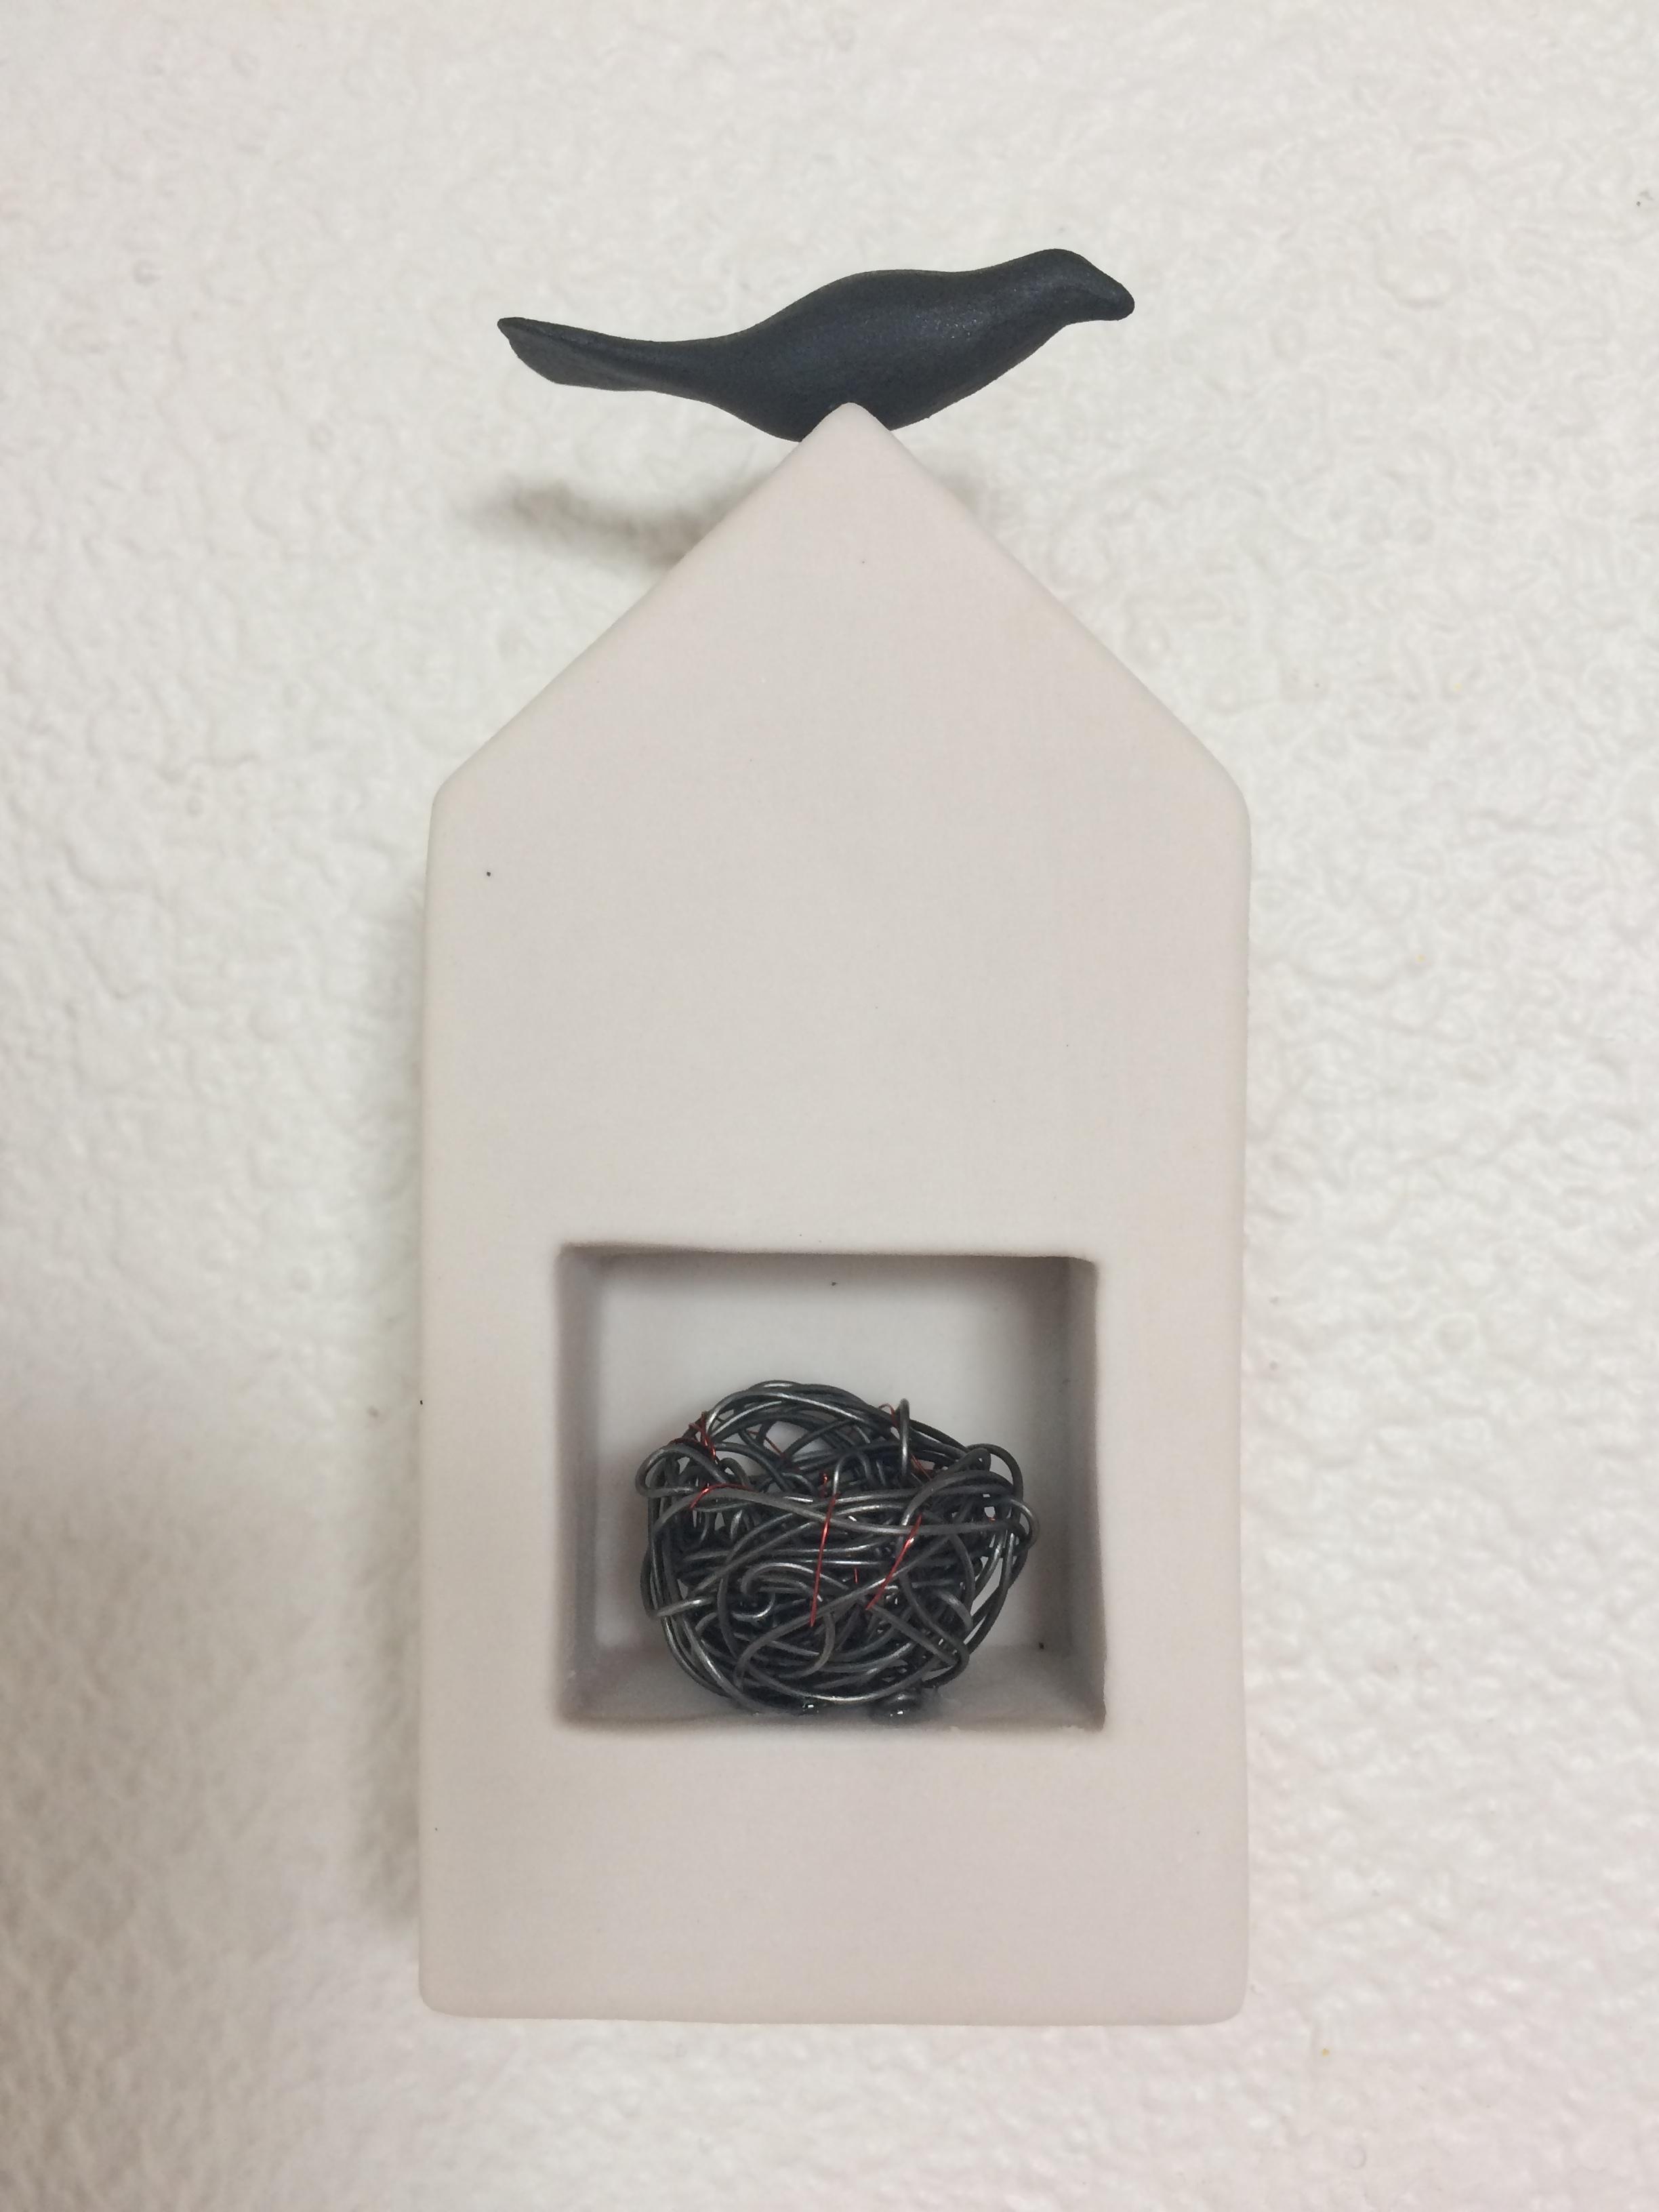 Bird with Nest